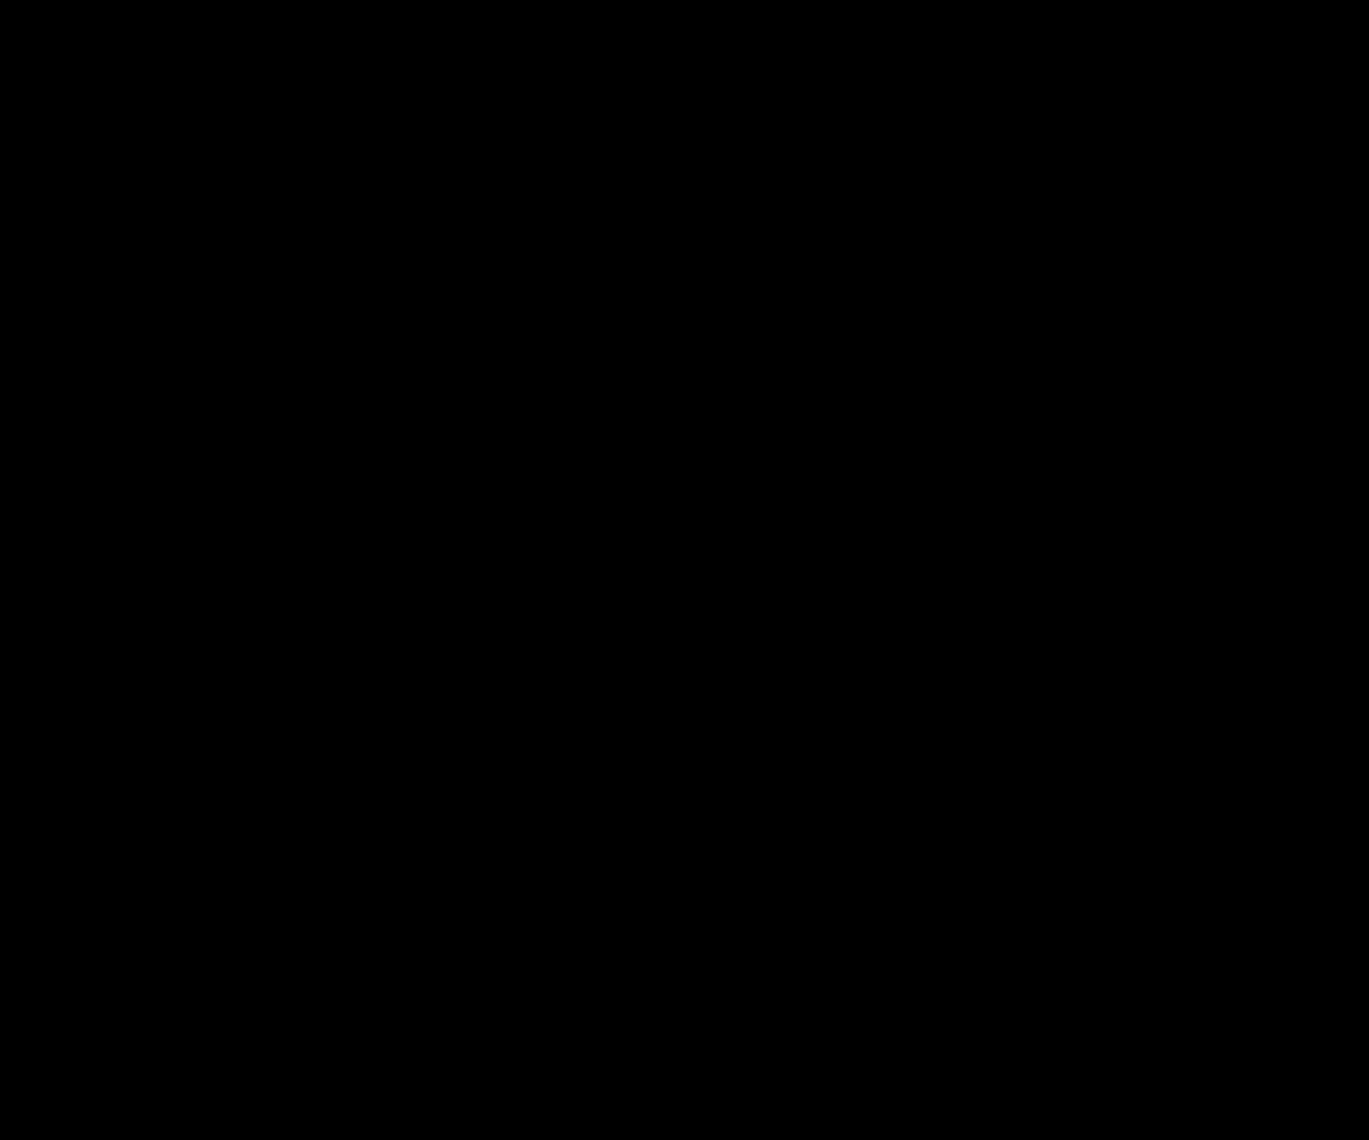 BewerberElement 1@3x.png